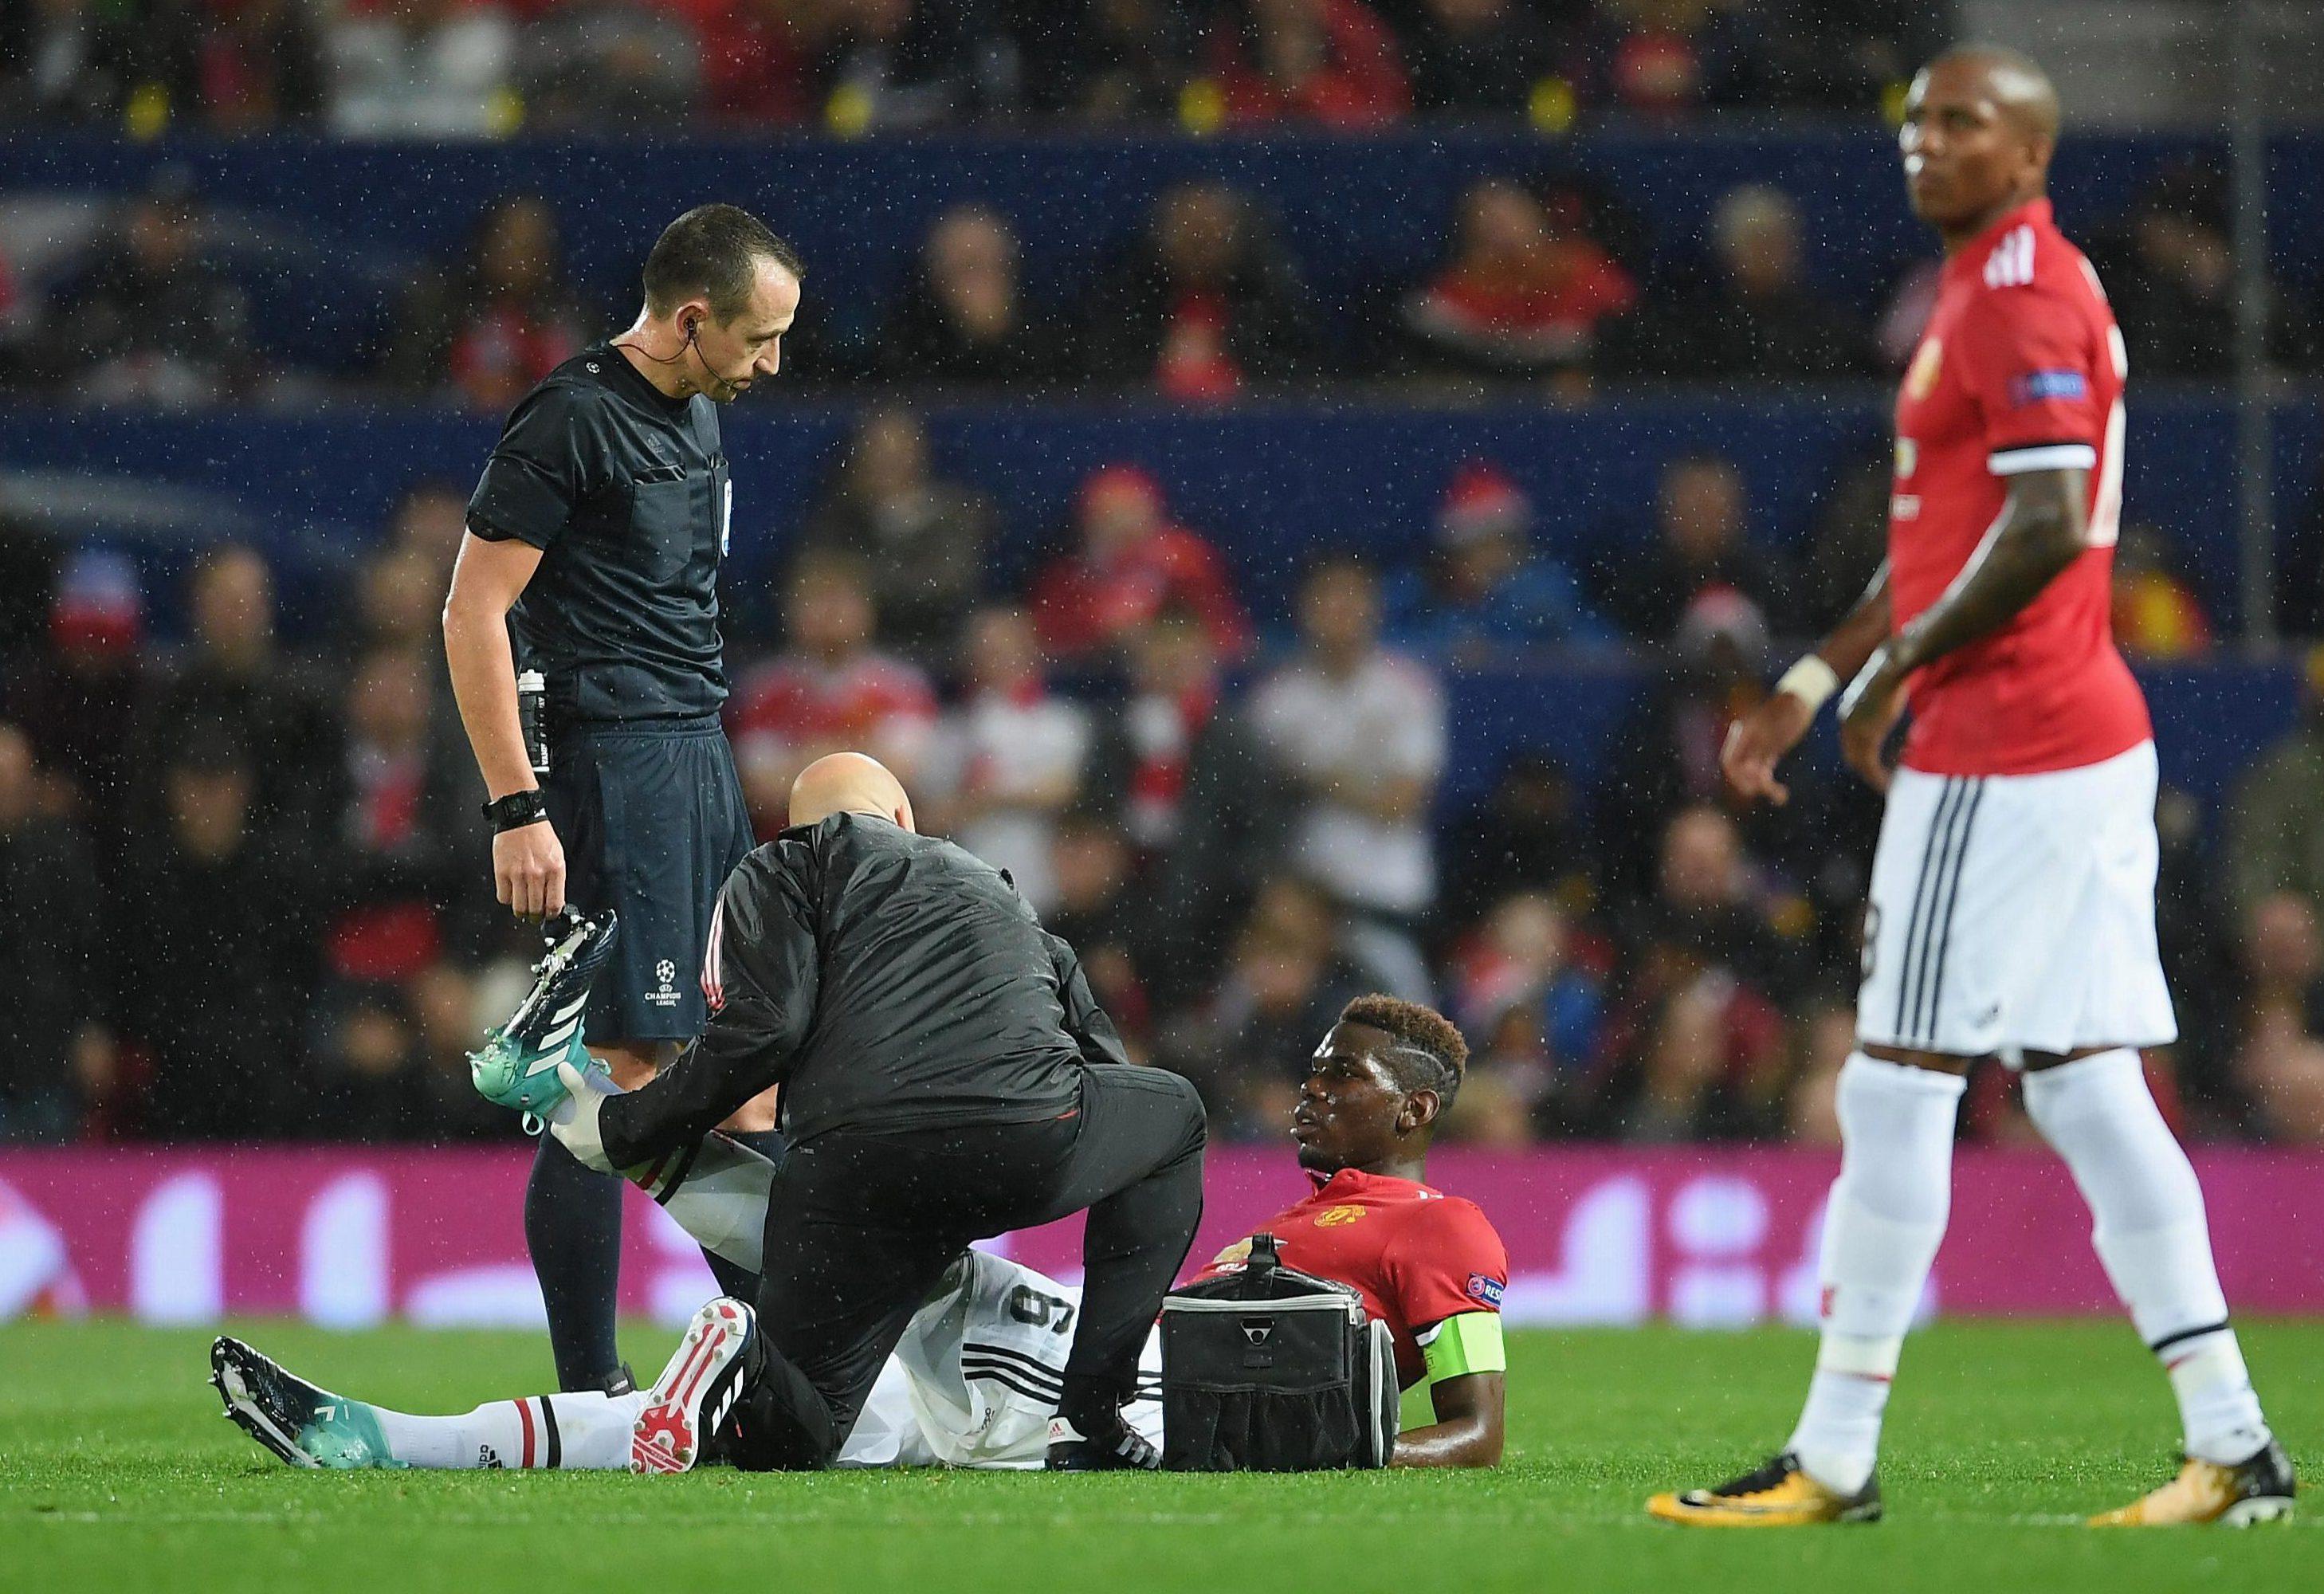 The former Juventus man injured his left leg against Basel